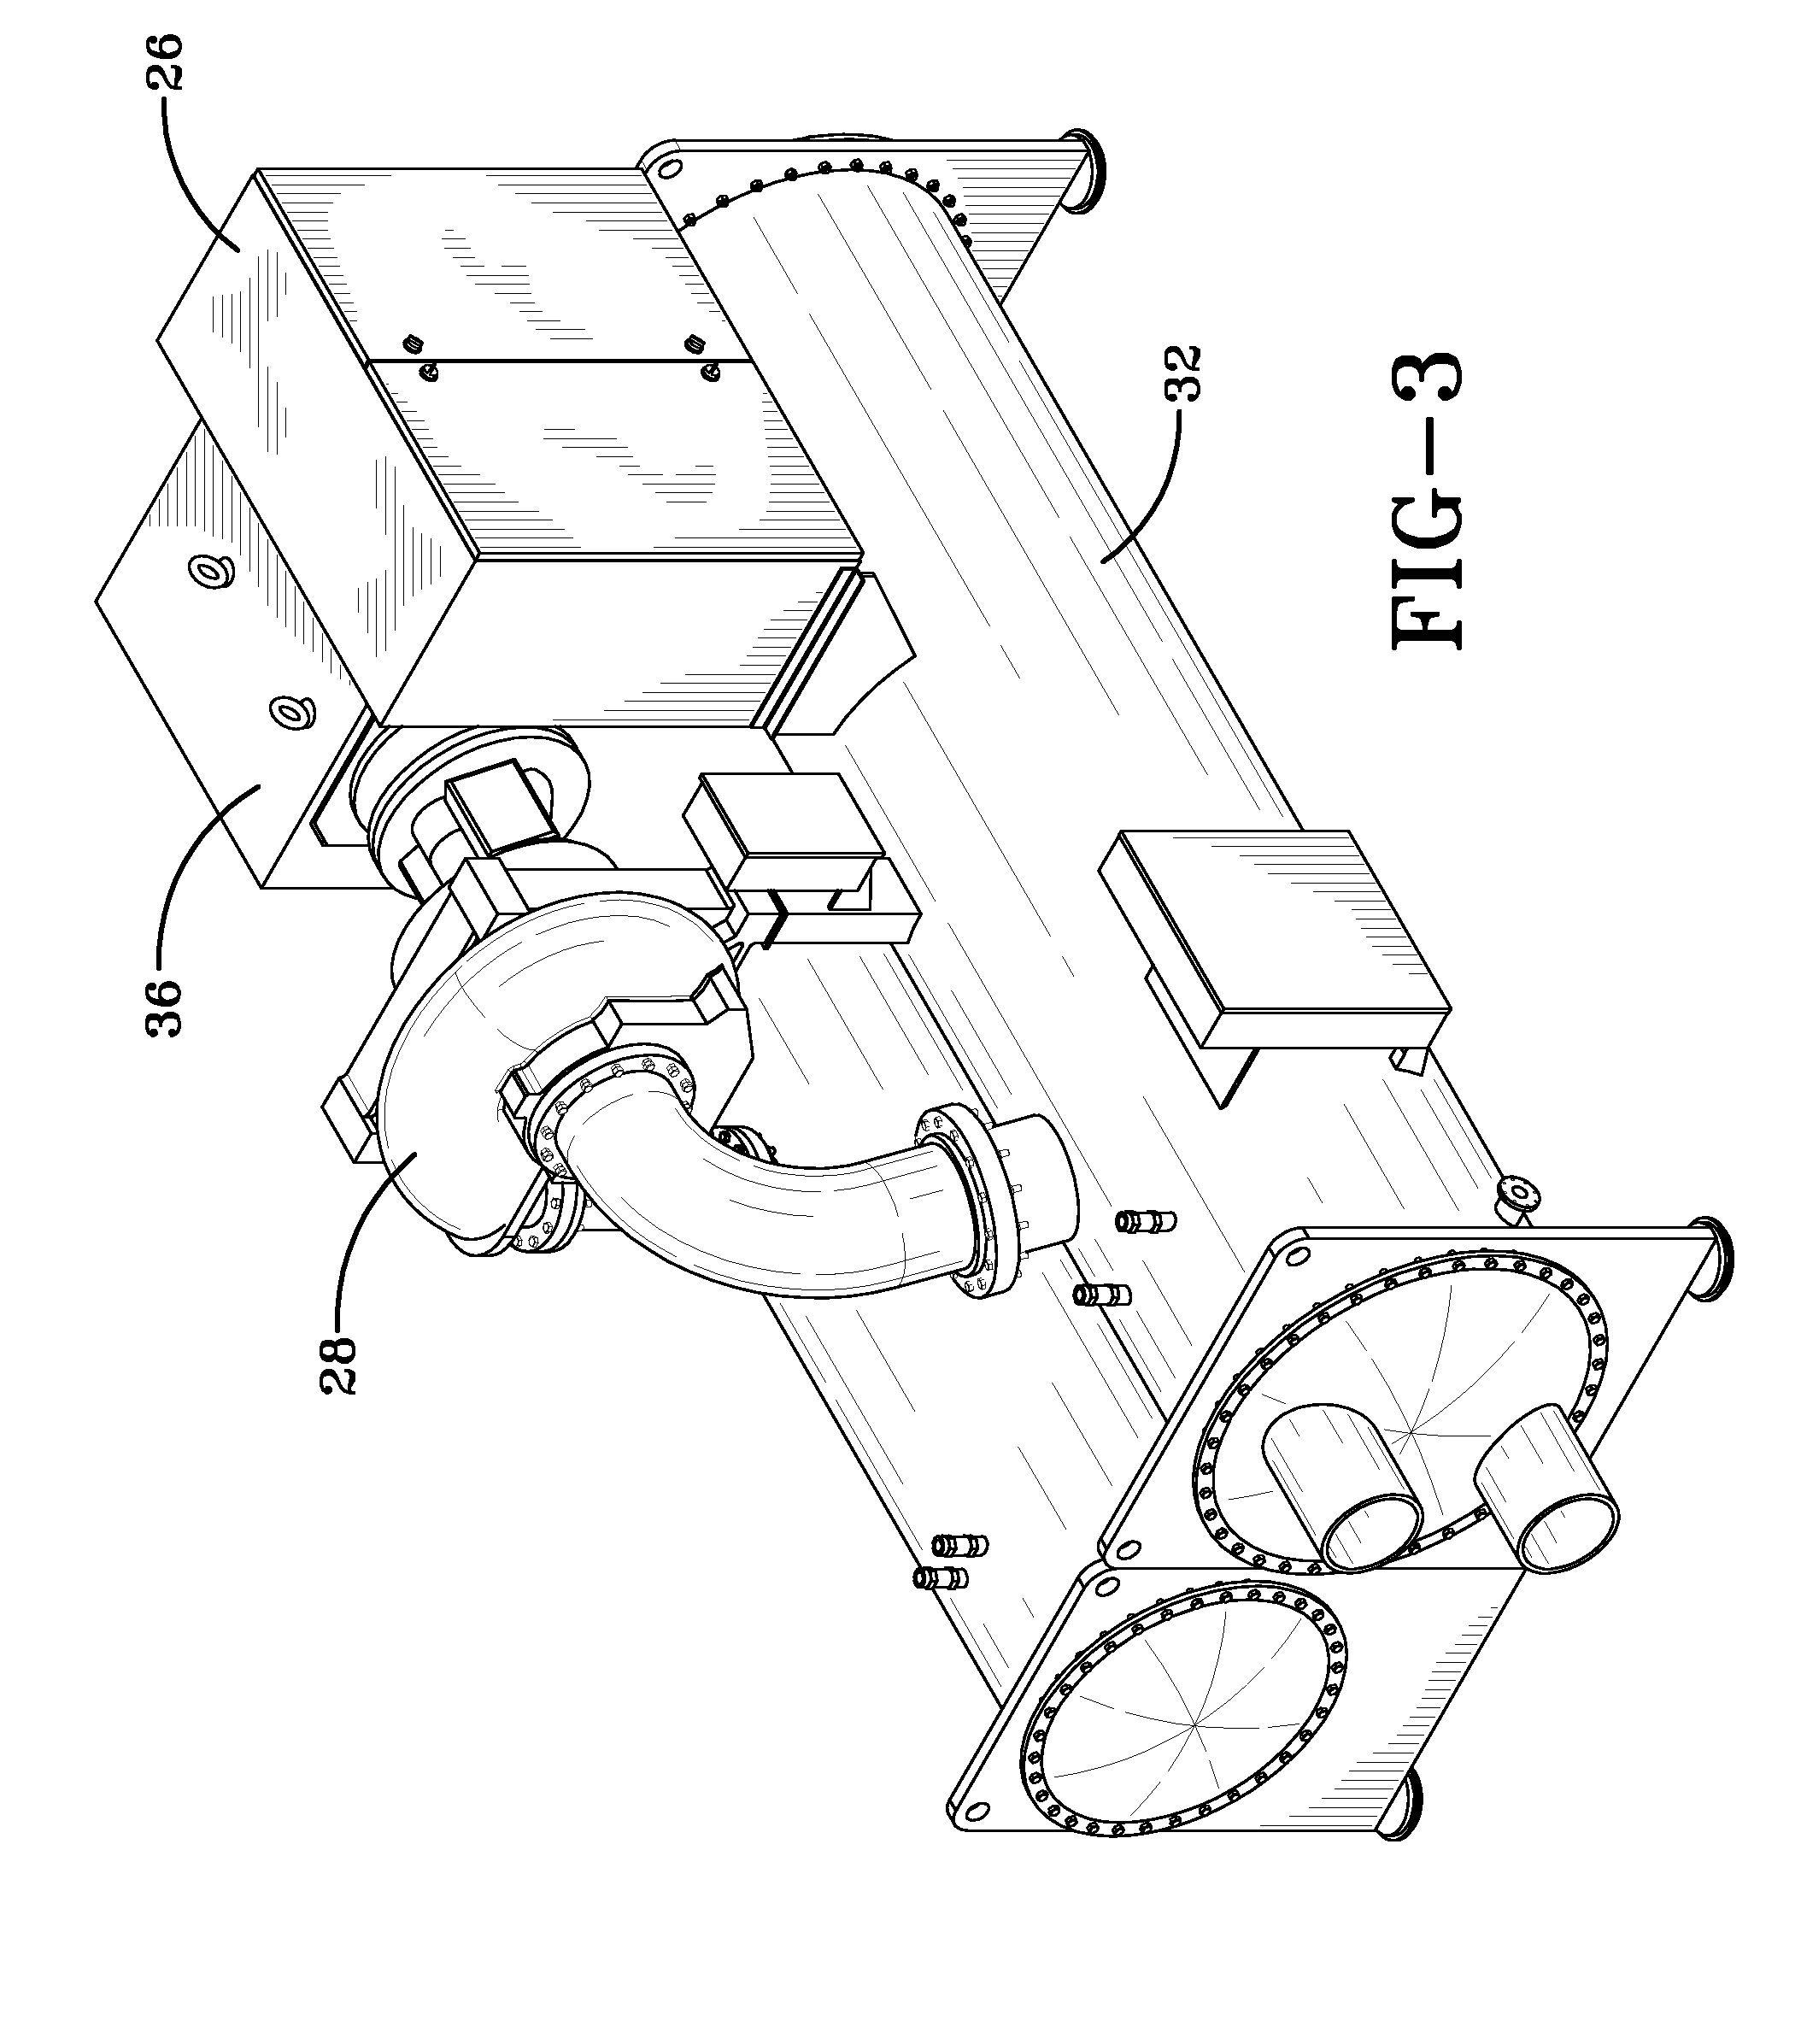 New Wiring Diagram Of Dol Motor Starter Diagram